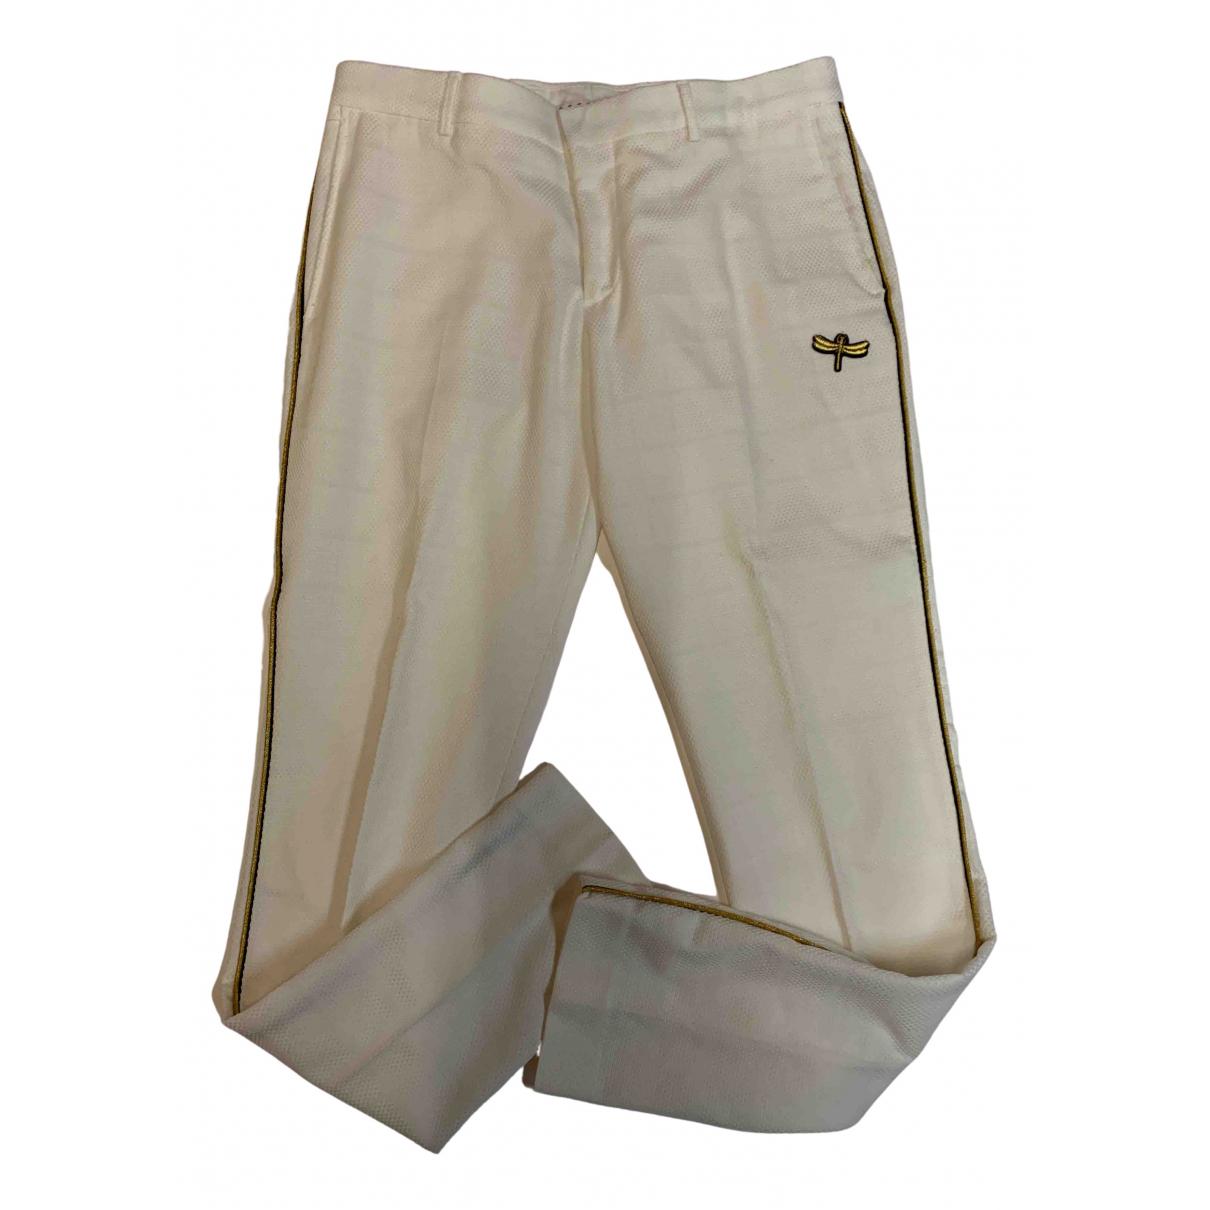 Zara N White Cotton Trousers for Men 32 UK - US